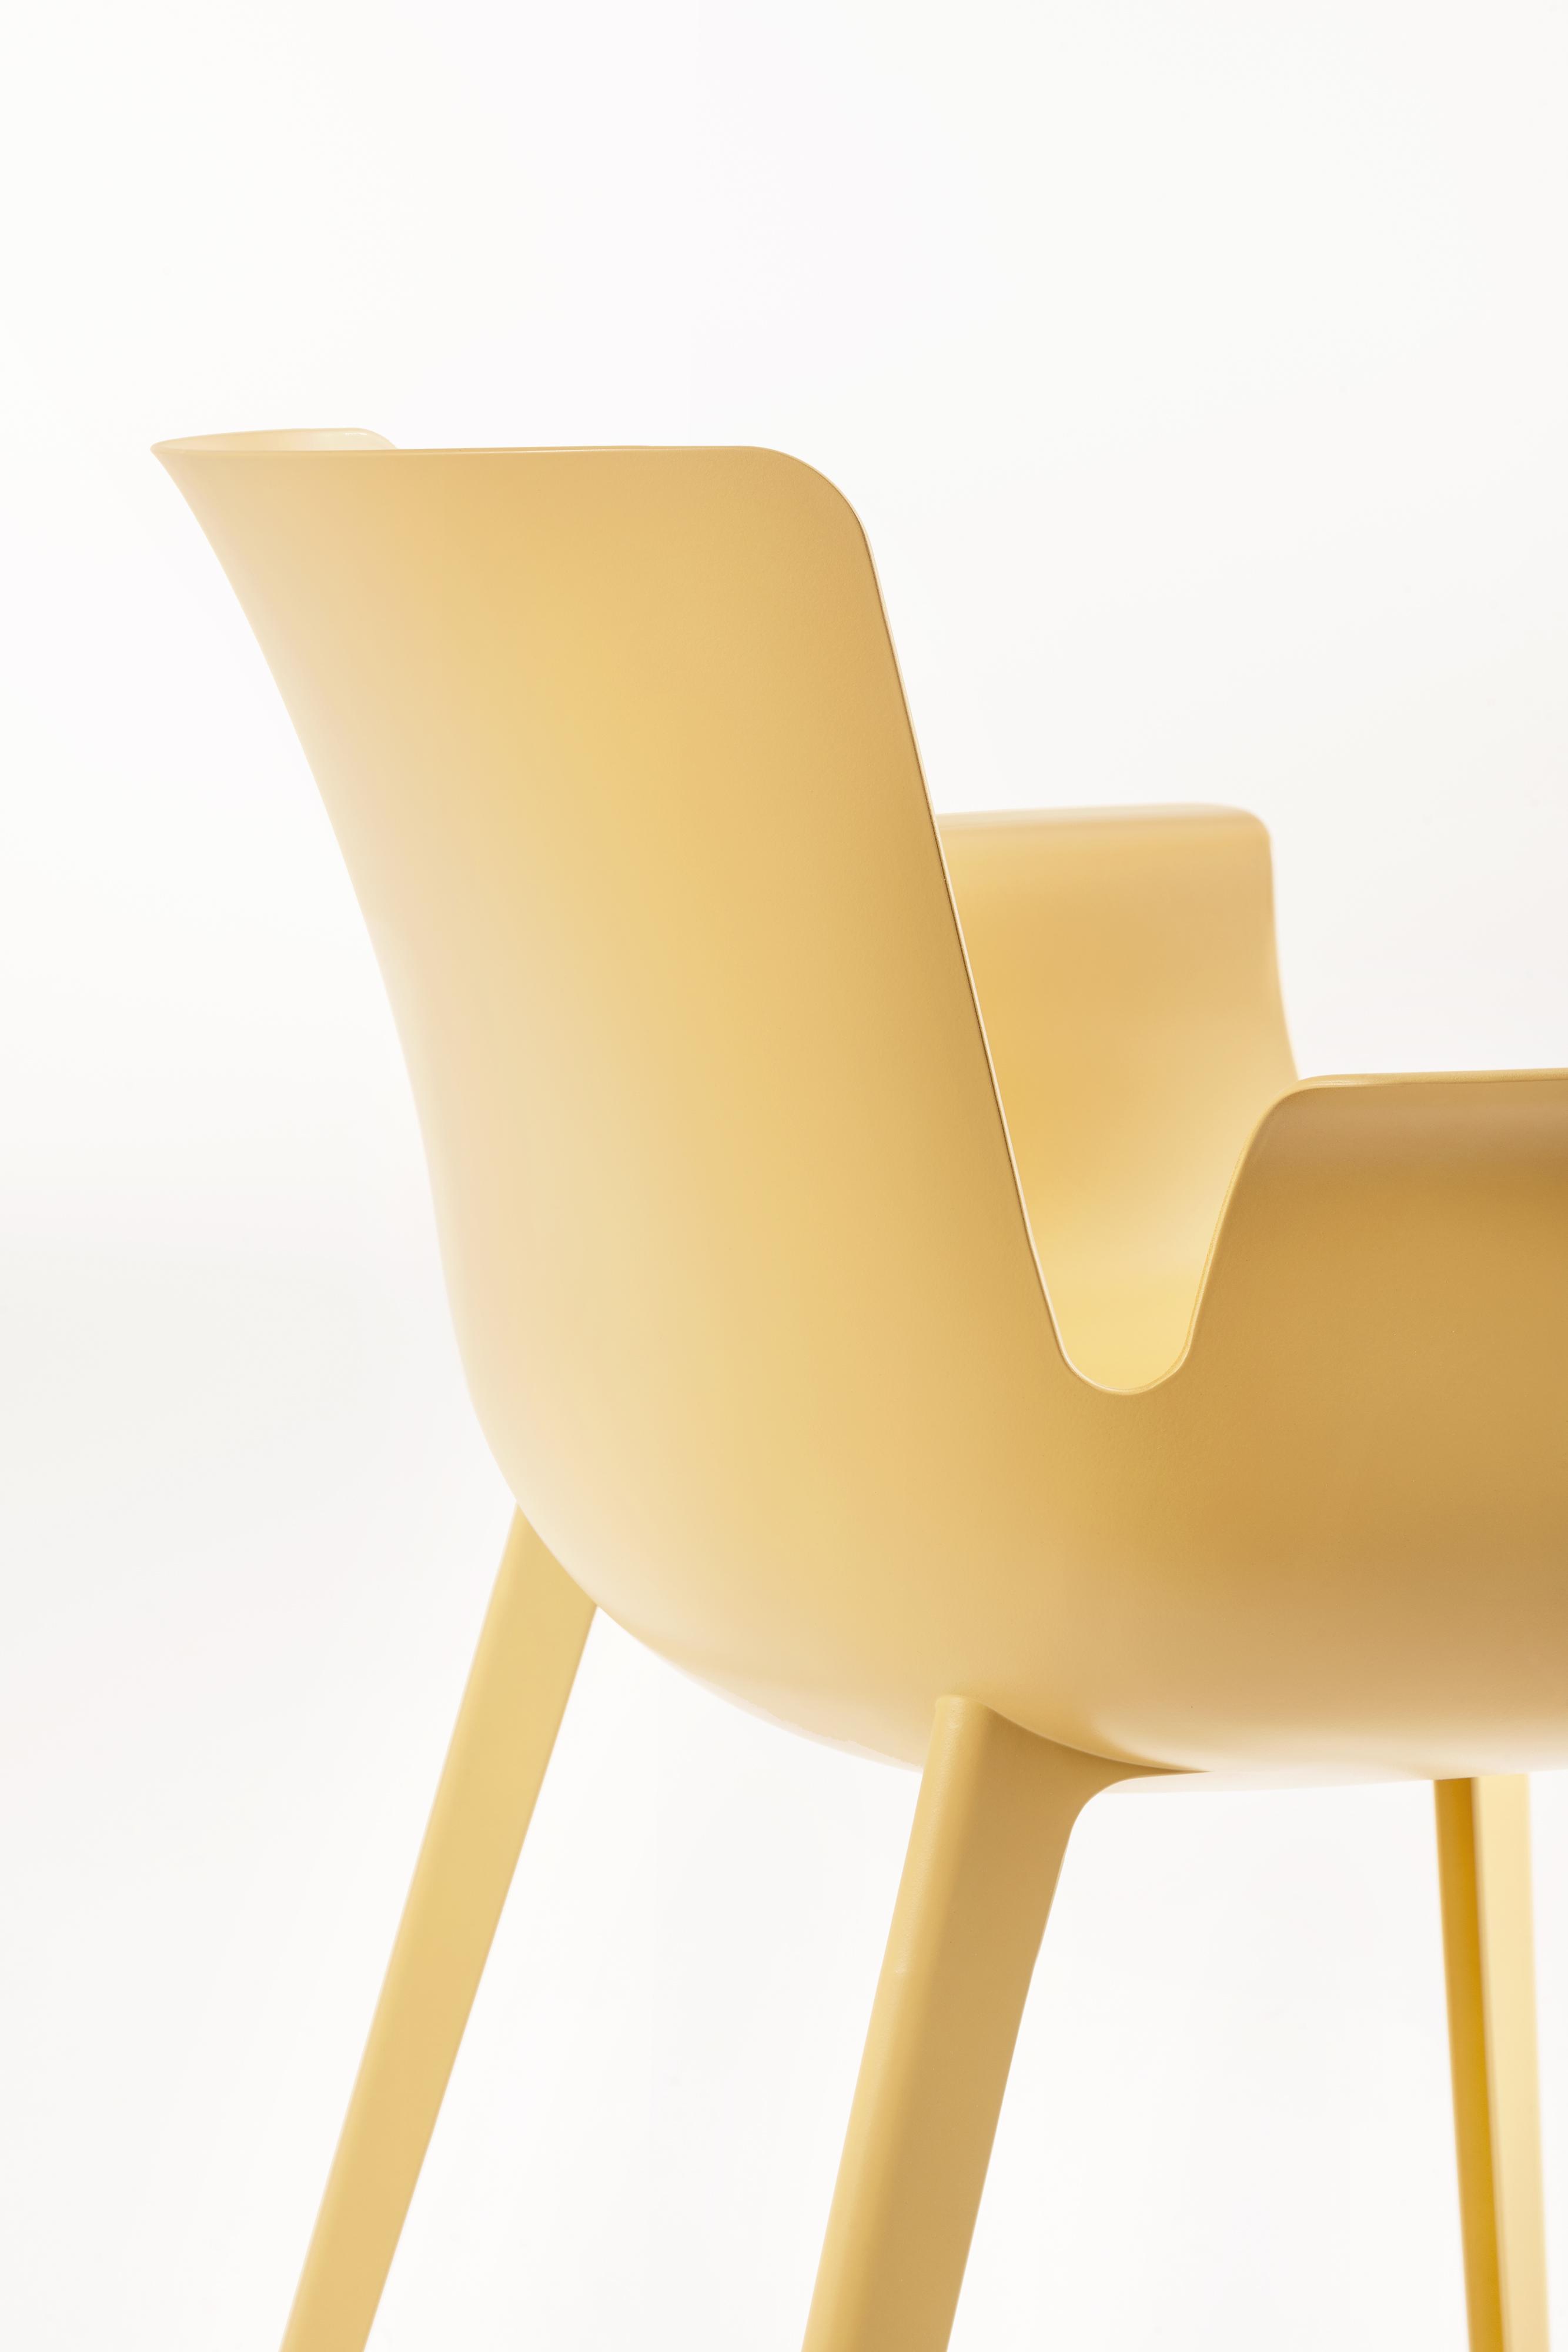 Piuma design Piero Lissoni per Kartell Peso 2.2 kg, spessore 2mm.